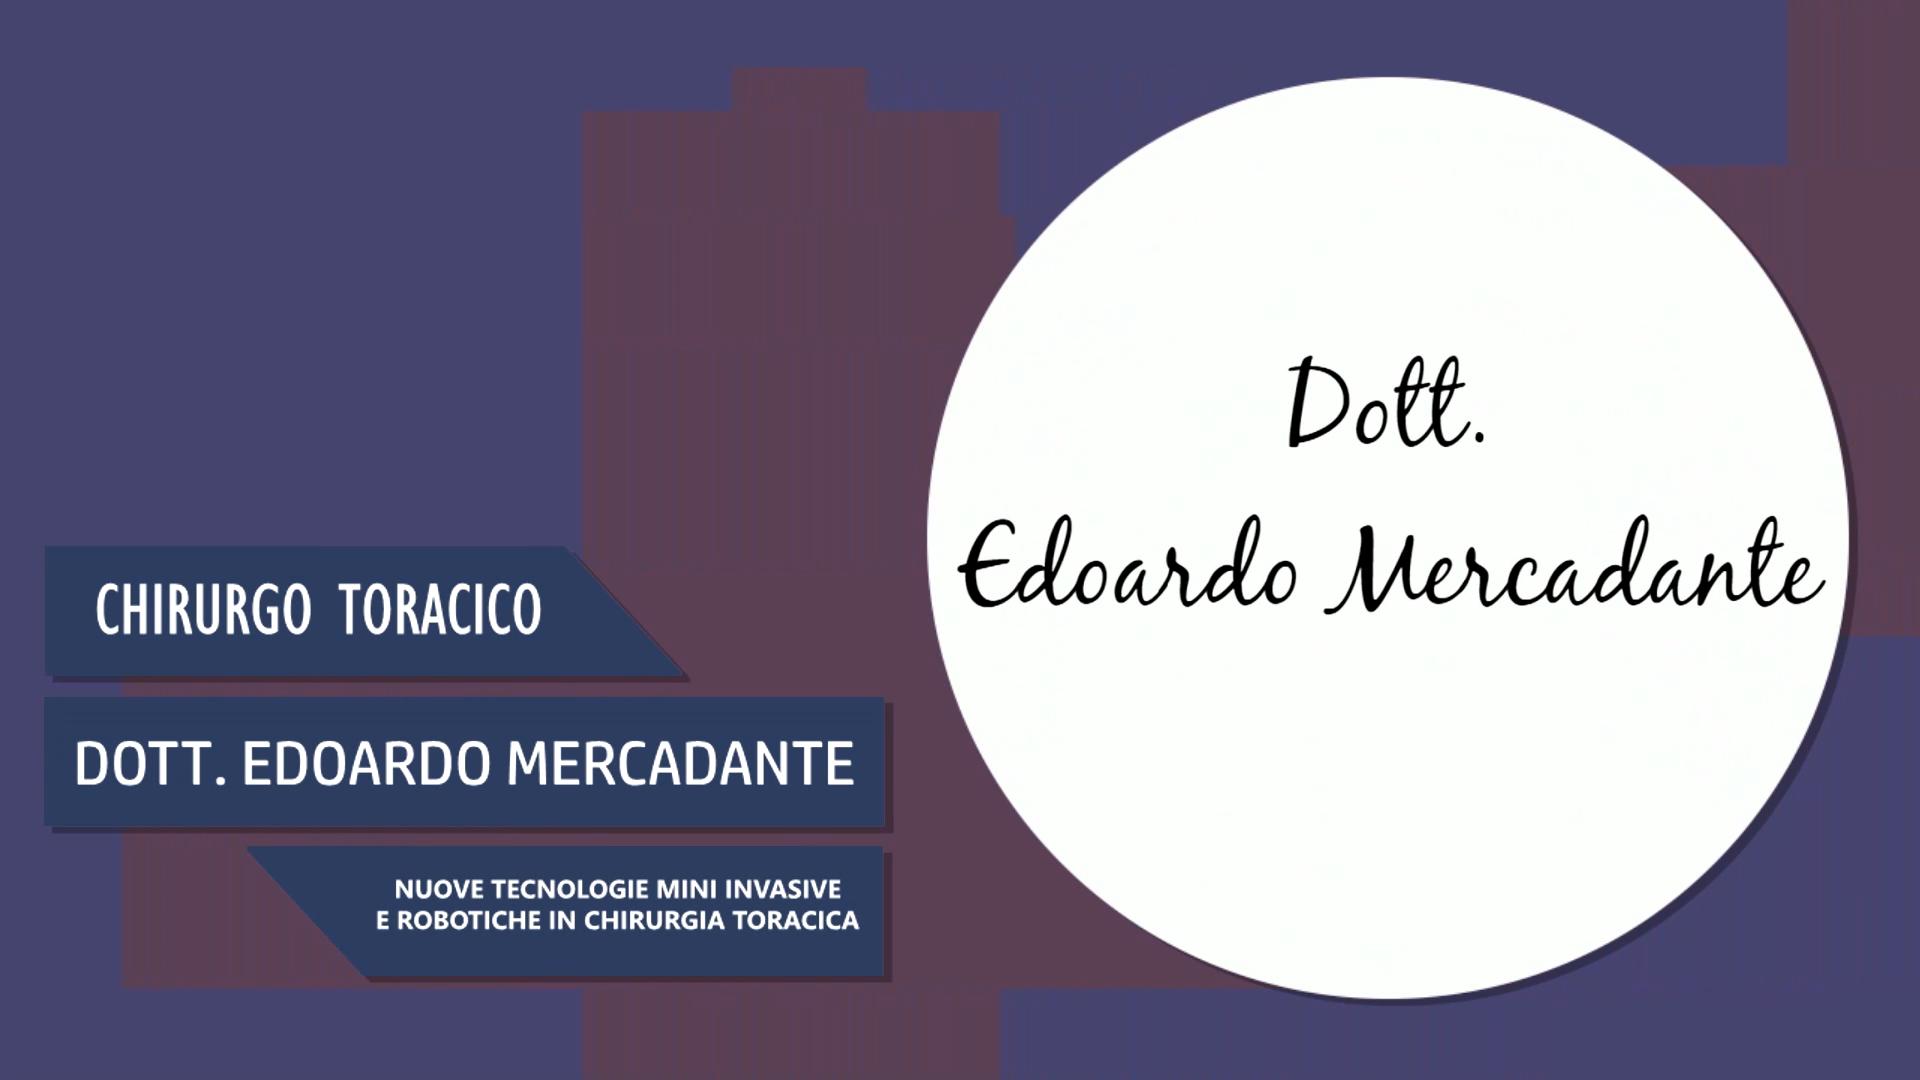 Dott. Edoardo Mercadante – Nuove Tecnologie Mini Invasive